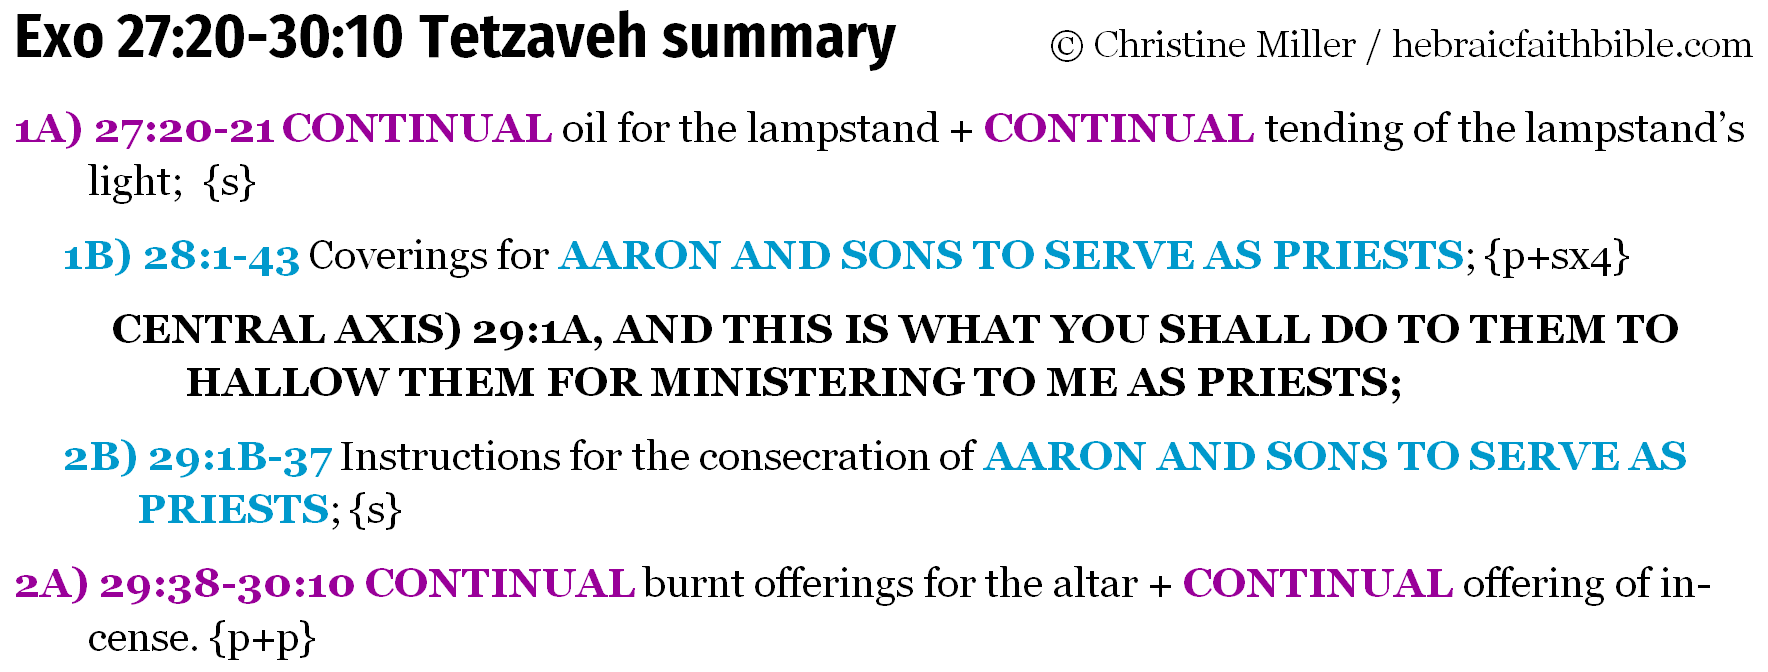 Exo 27:20-30:10 Tetzaveh Chiasm summary | hebraicfaithbible.com